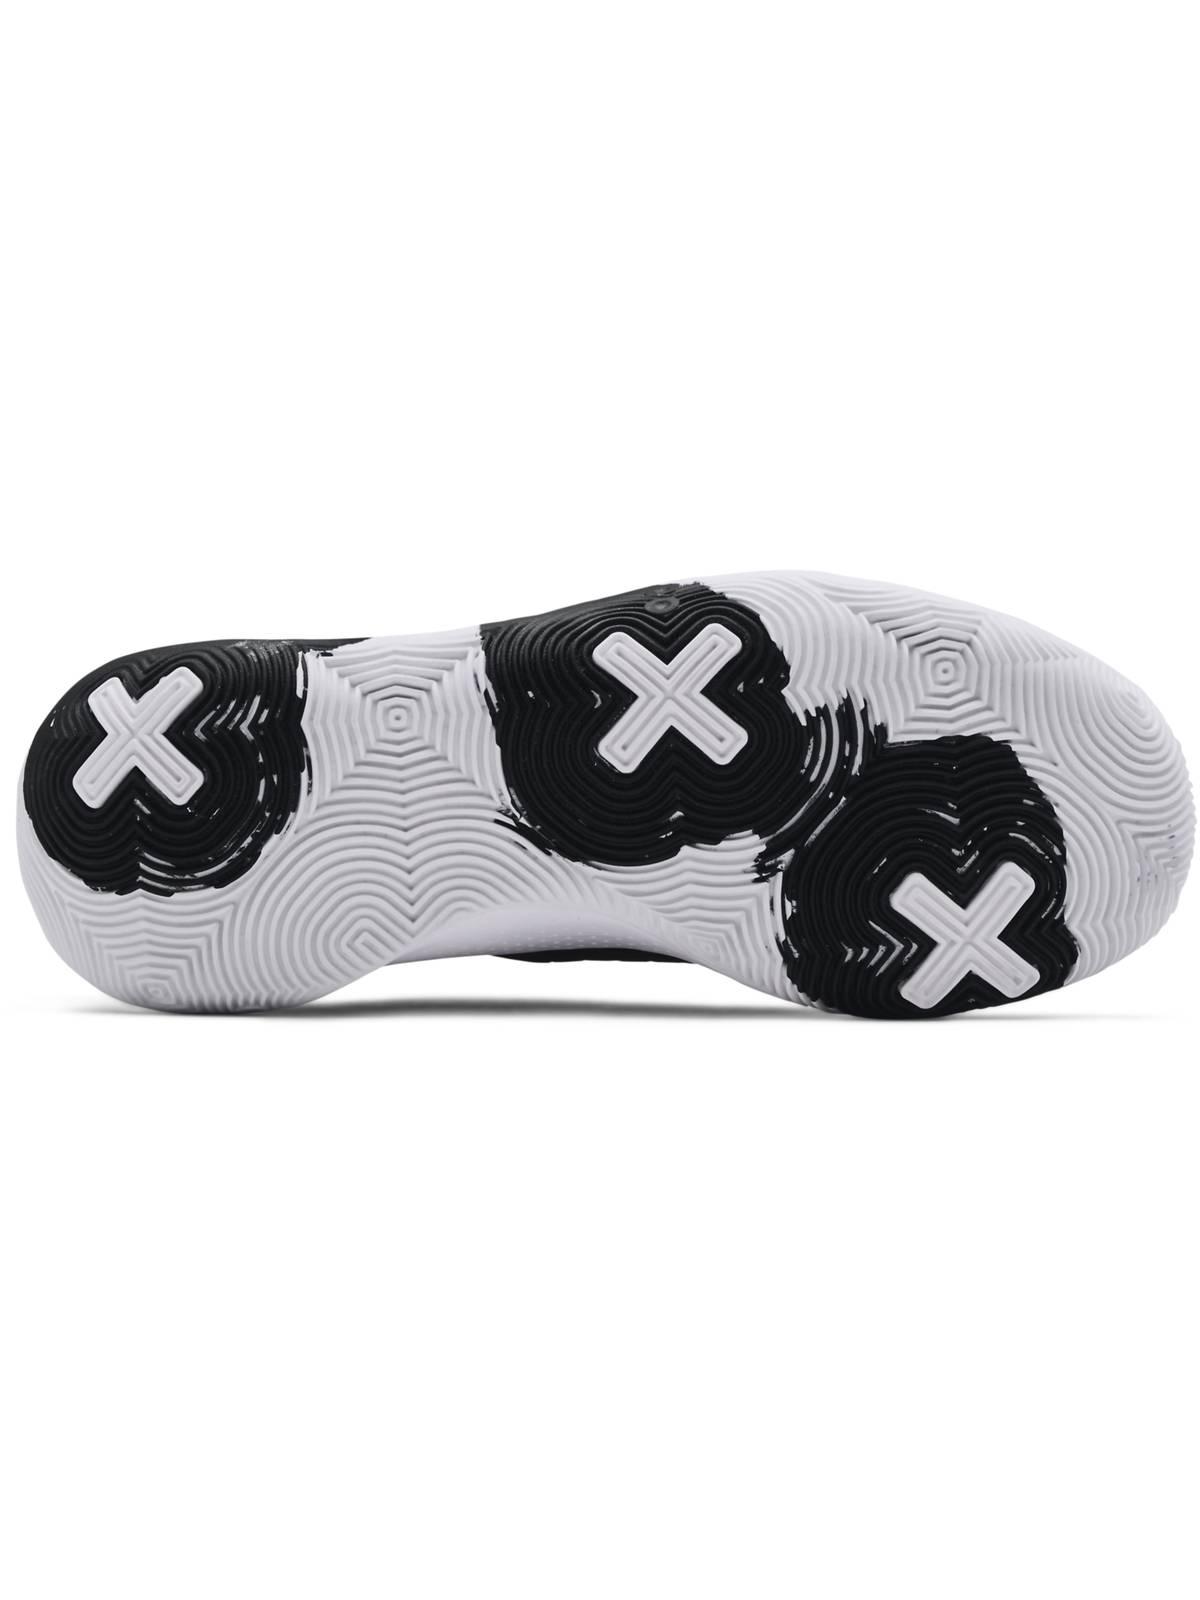 Unisex UA Spawn 3 Basketbol Ayakkabısı Siyah